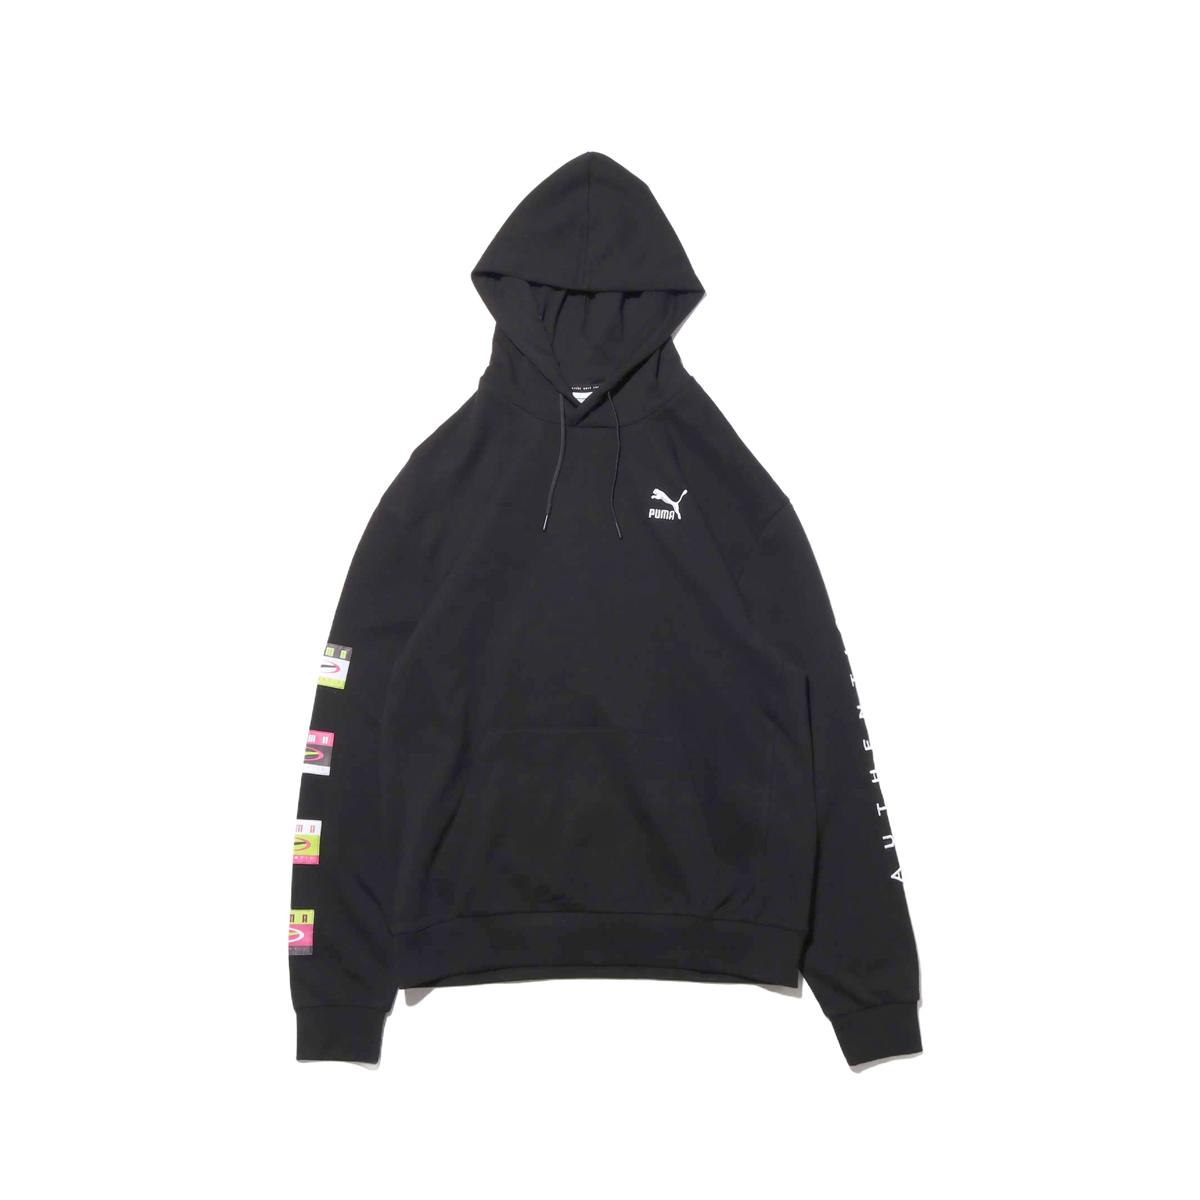 PUMA 90S RETRO HOODY(プーマ 90S レトロ フーディー)COTTON BLACK【メンズ パーカー】19SP-I